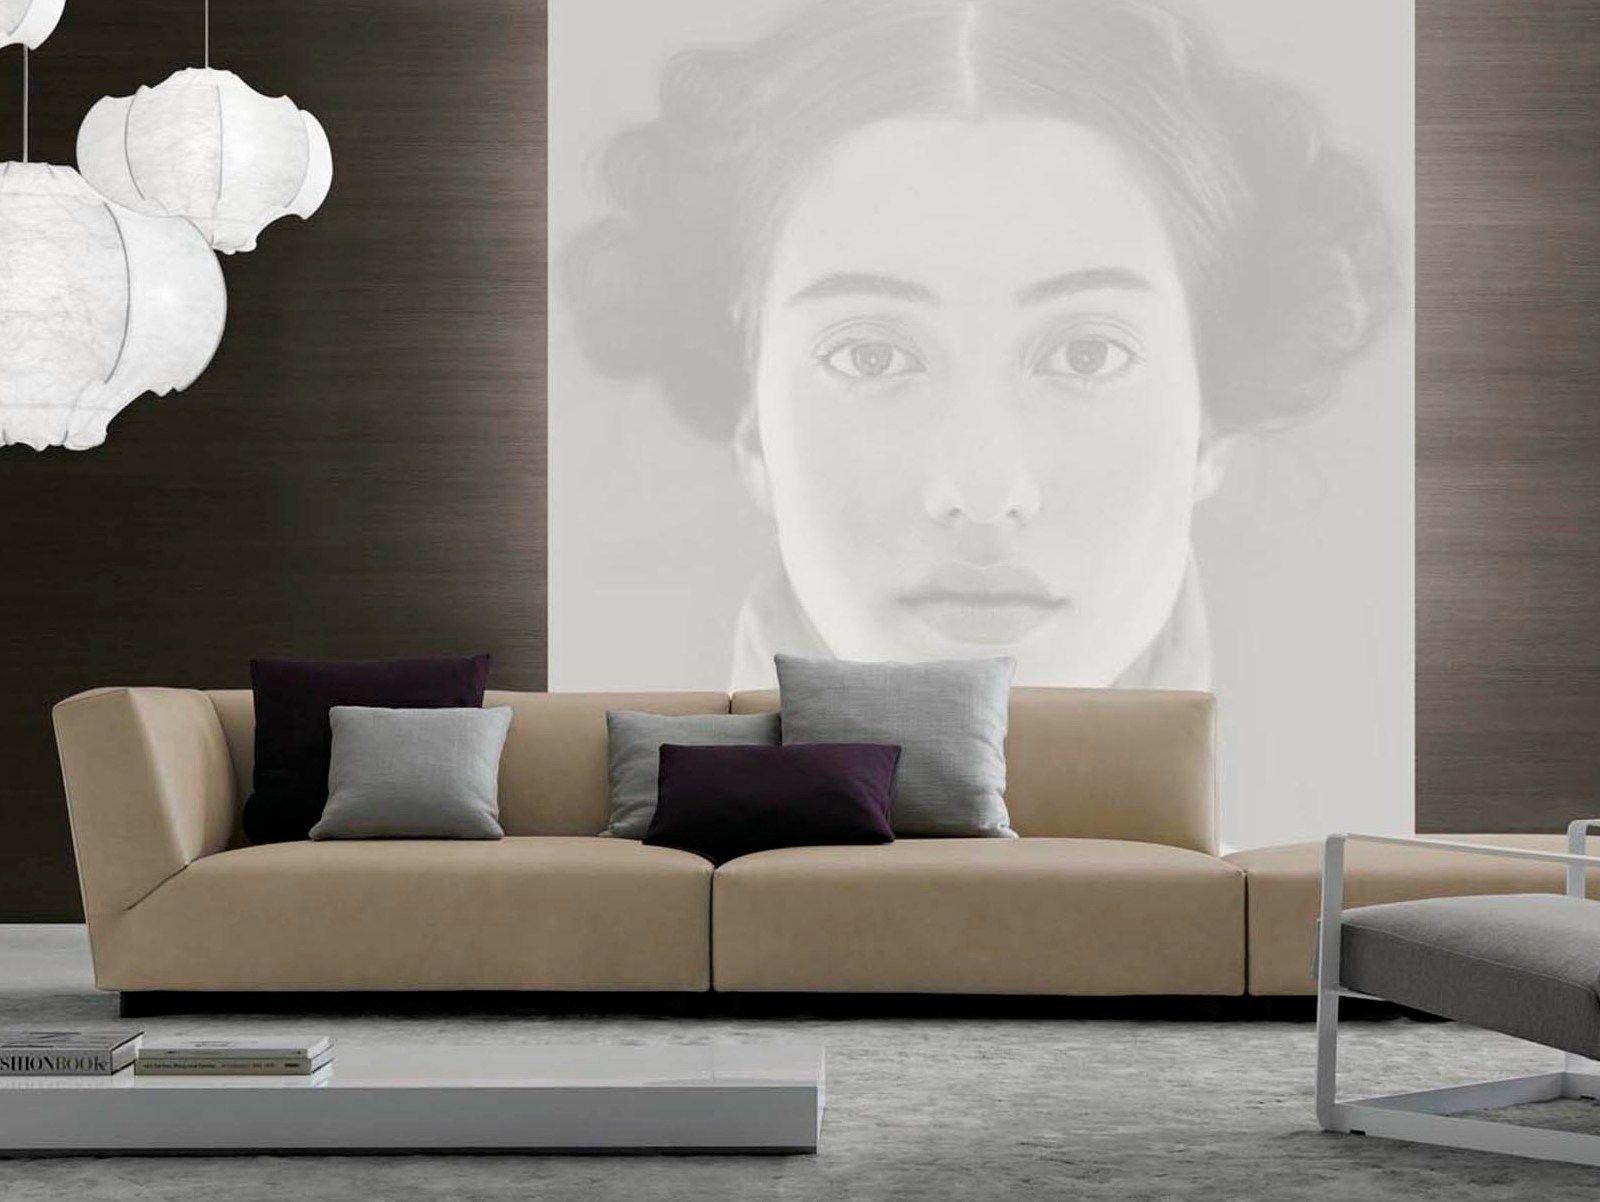 Superb MONDRIAN | Sofa Mondrian Collection By Poliform Design Jean Marie Massaud